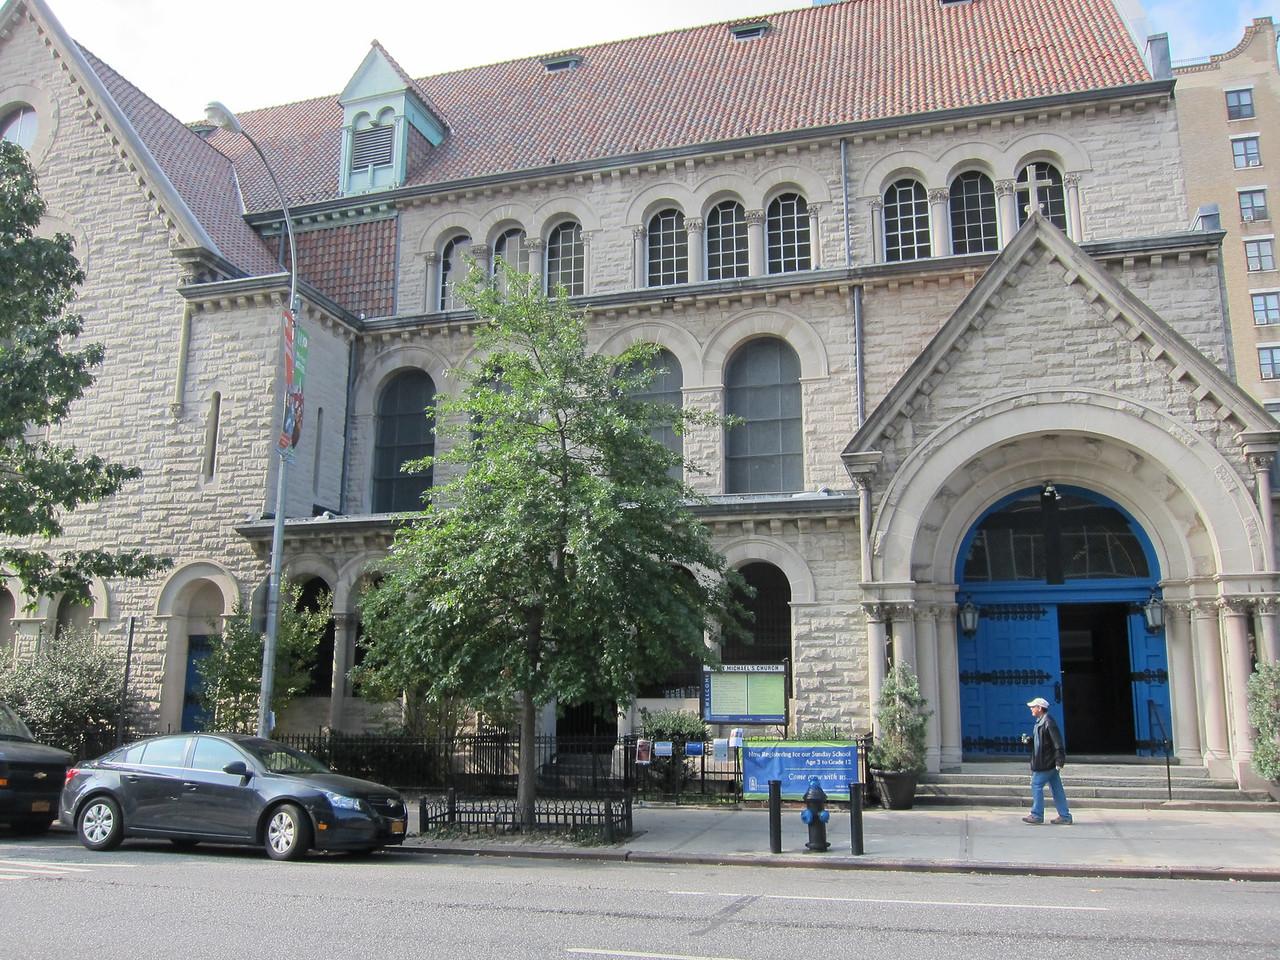 St Michael's Church_2013-11-264469_vew from across Amsterdam